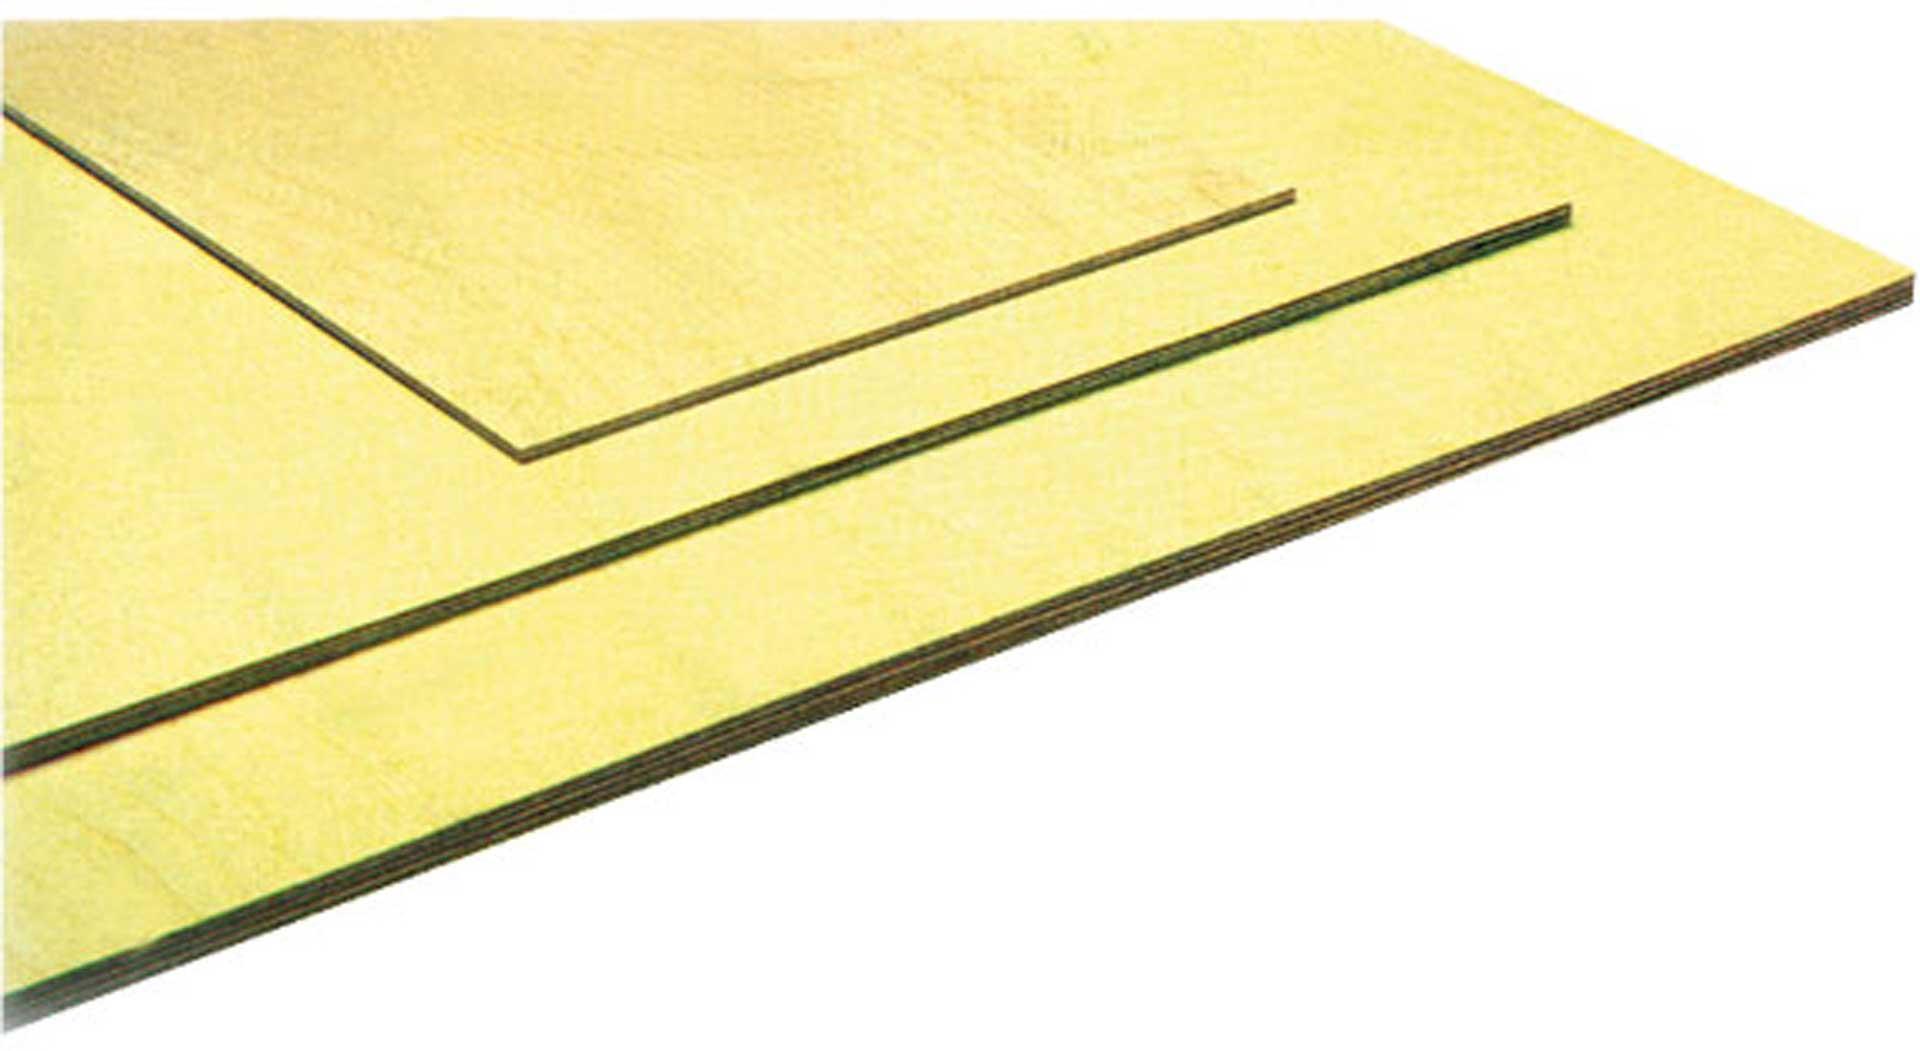 MODELLBAU LINDINGER BIRCH-SPERRY 4,0/300/1000MM